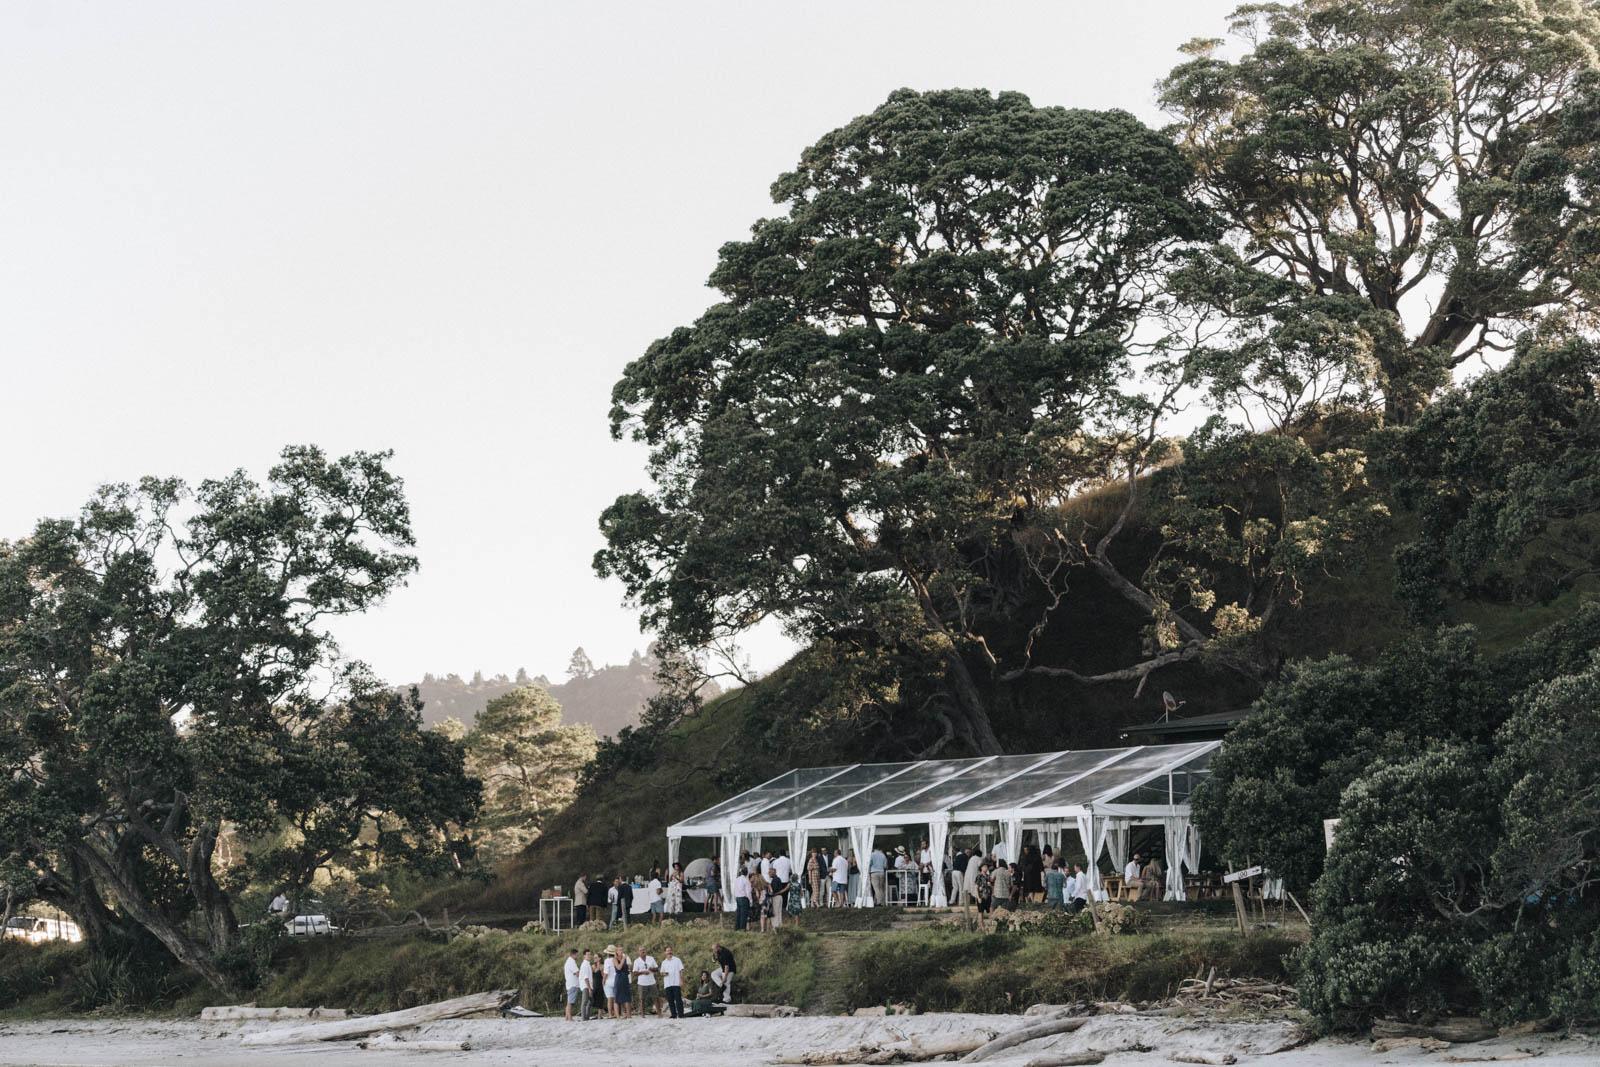 newfound-l-i-coromandel-wedding-photographer-1844-A9_04775